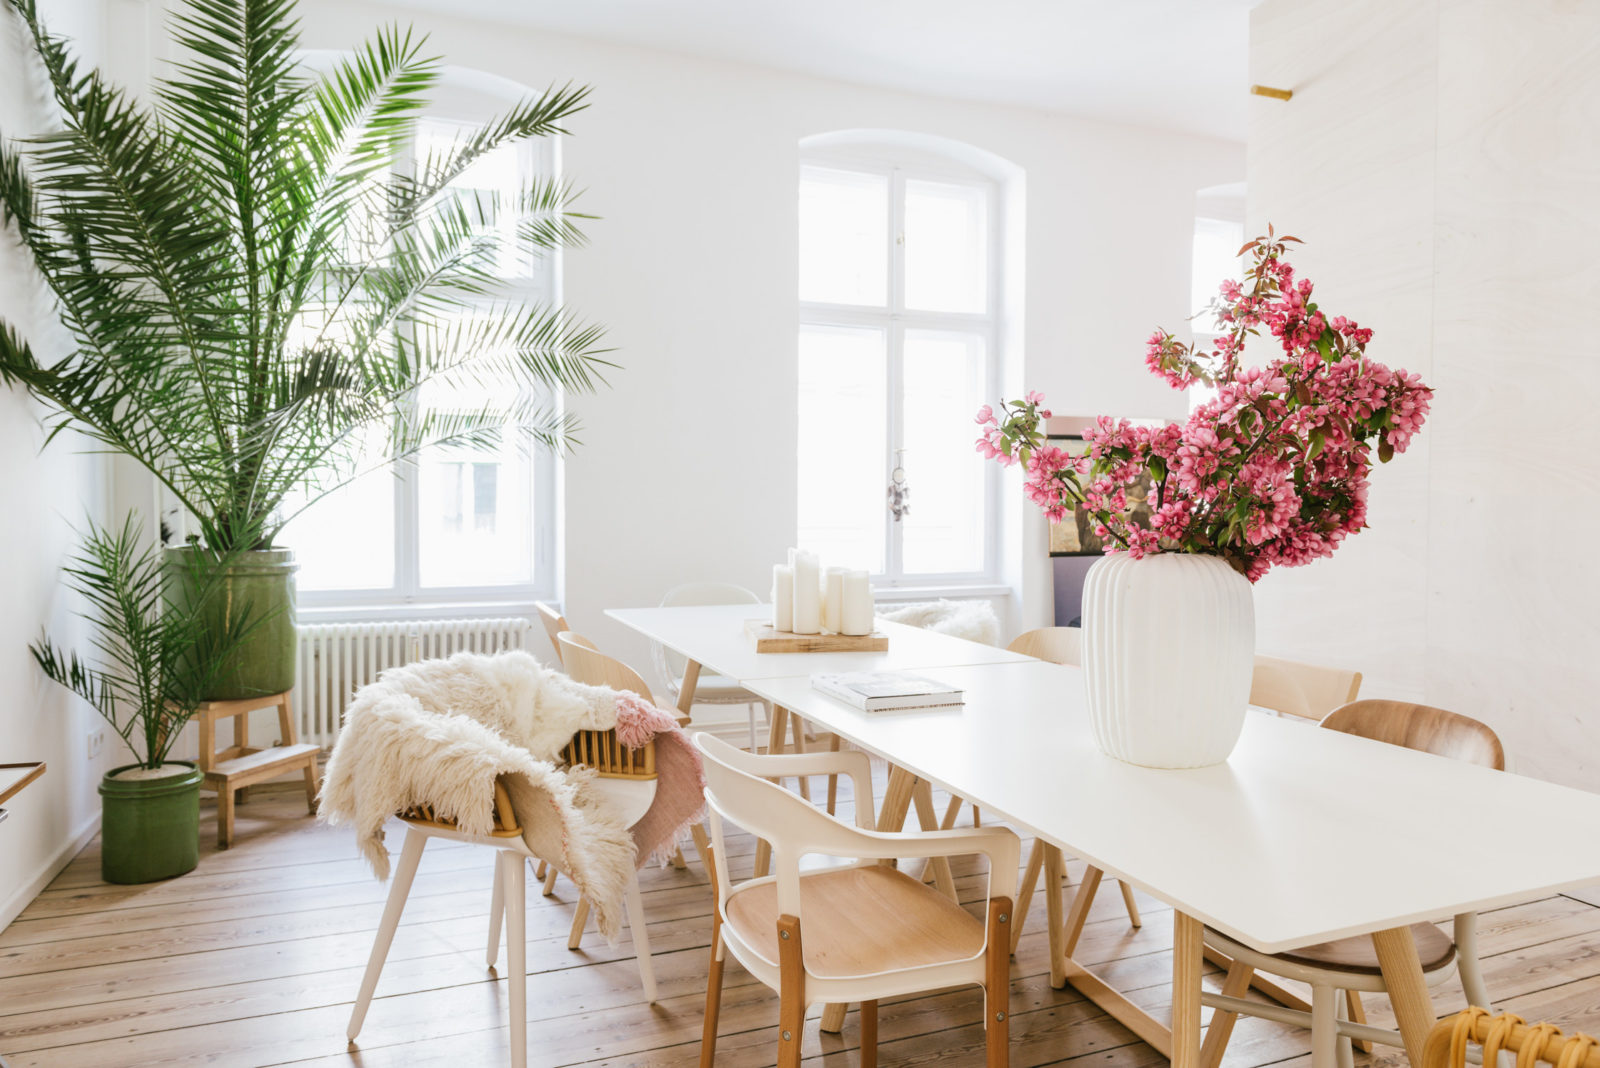 about freunde von freunden. Black Bedroom Furniture Sets. Home Design Ideas